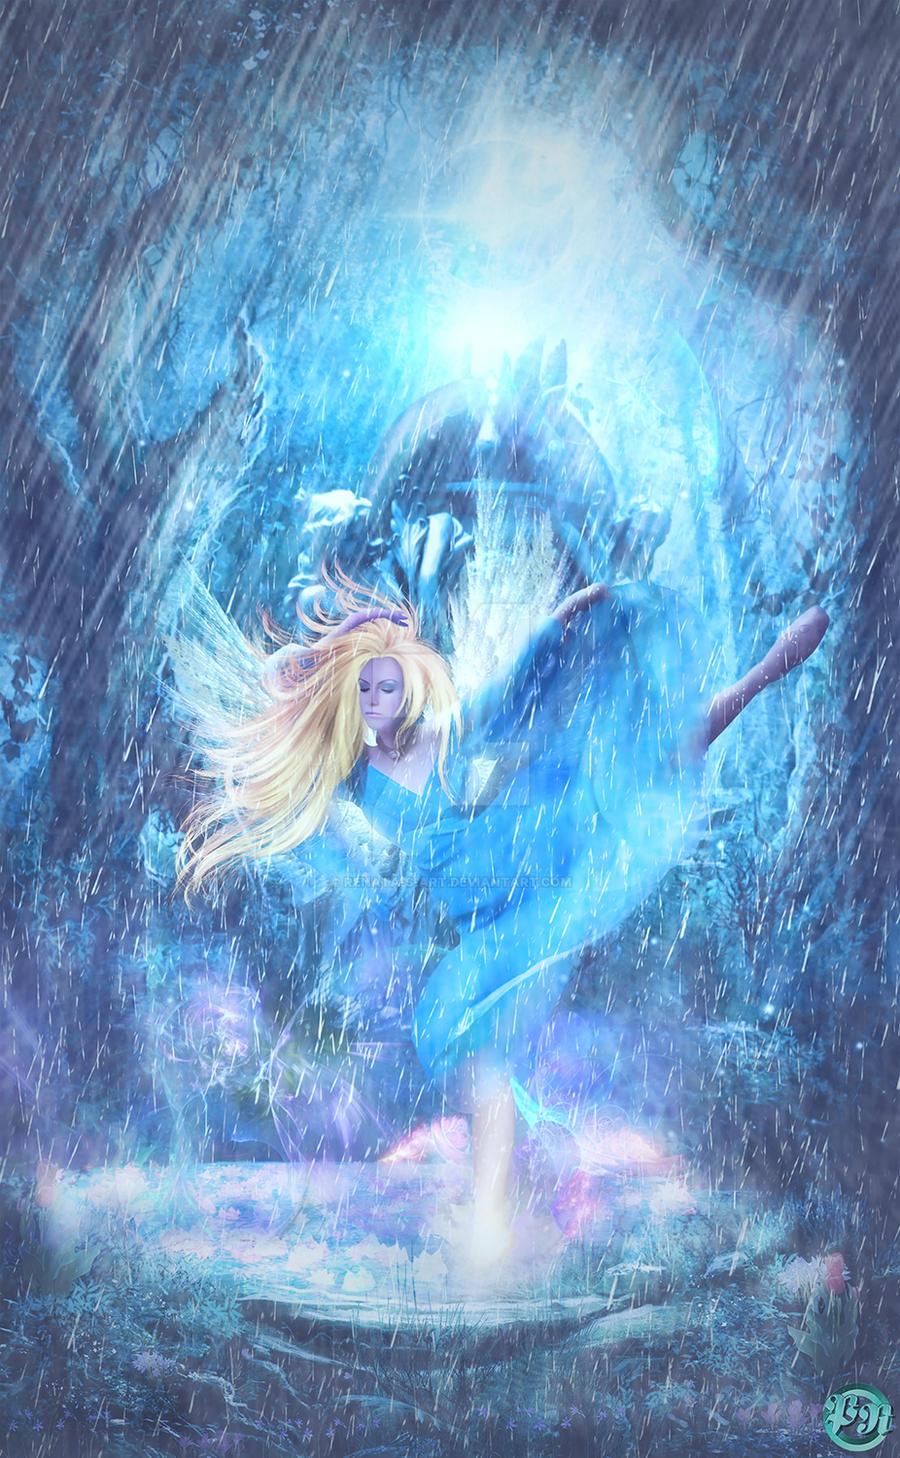 Amada lluvia(Beloved rain)